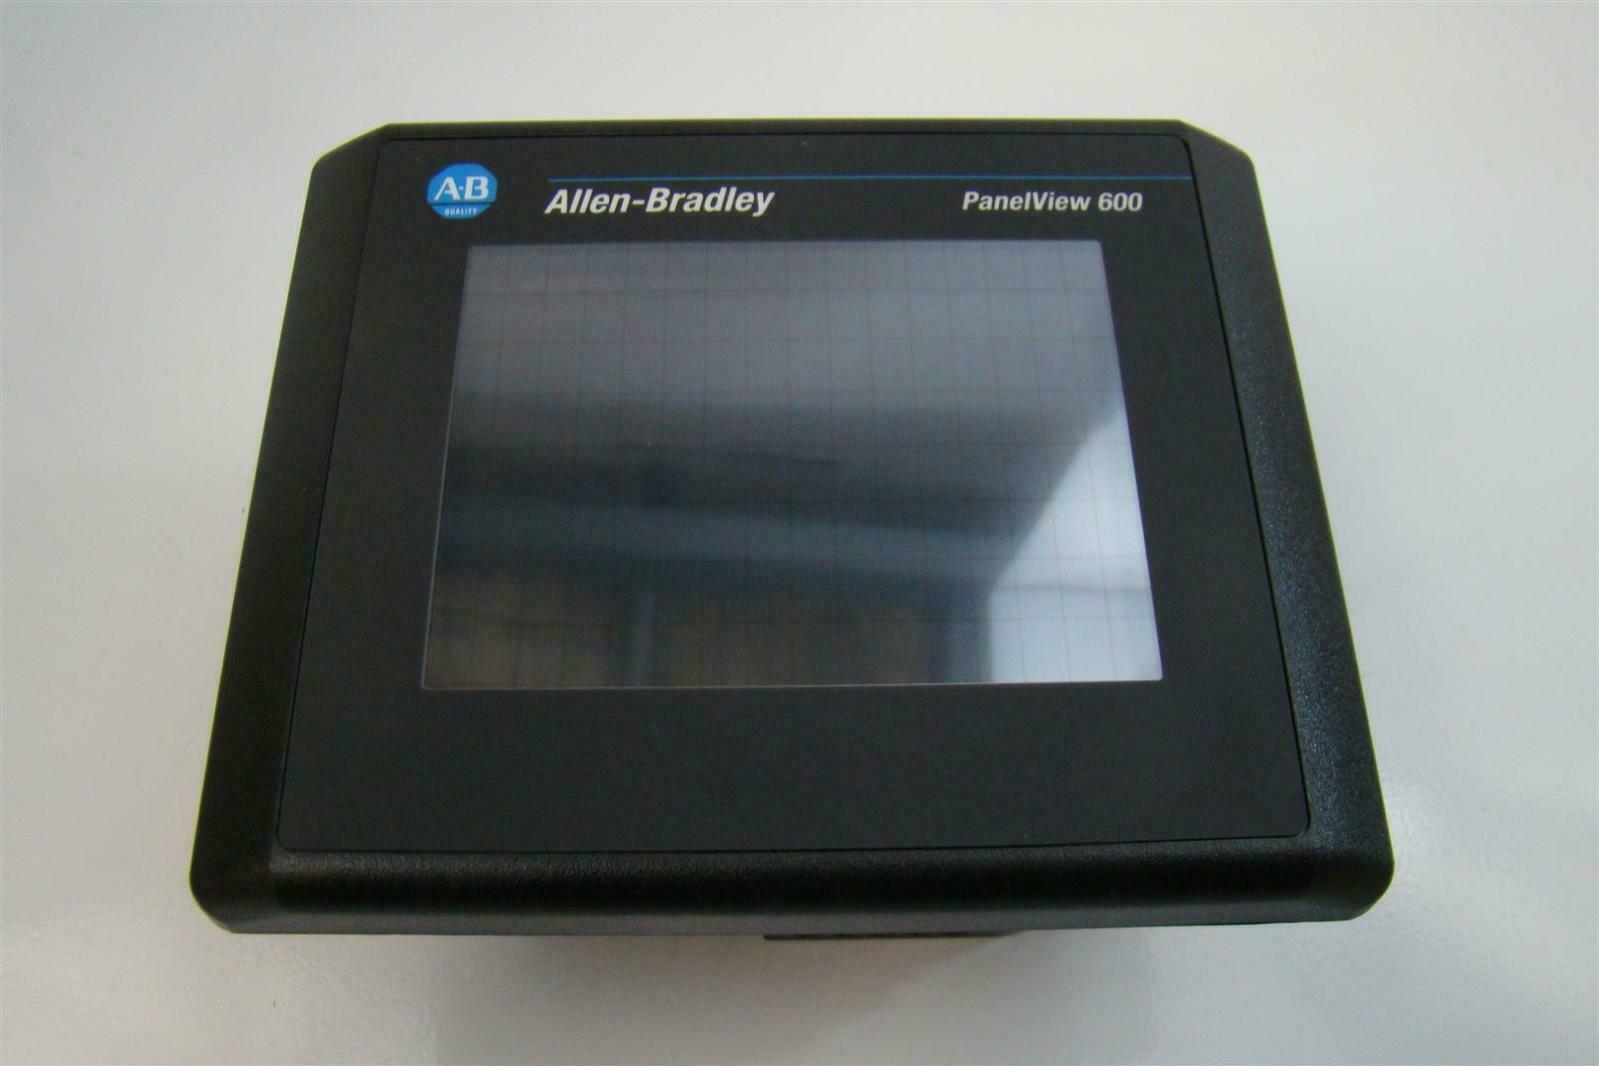 Allen-Bradley 24VDC 24W PanelView 600 2711-T6C20L1